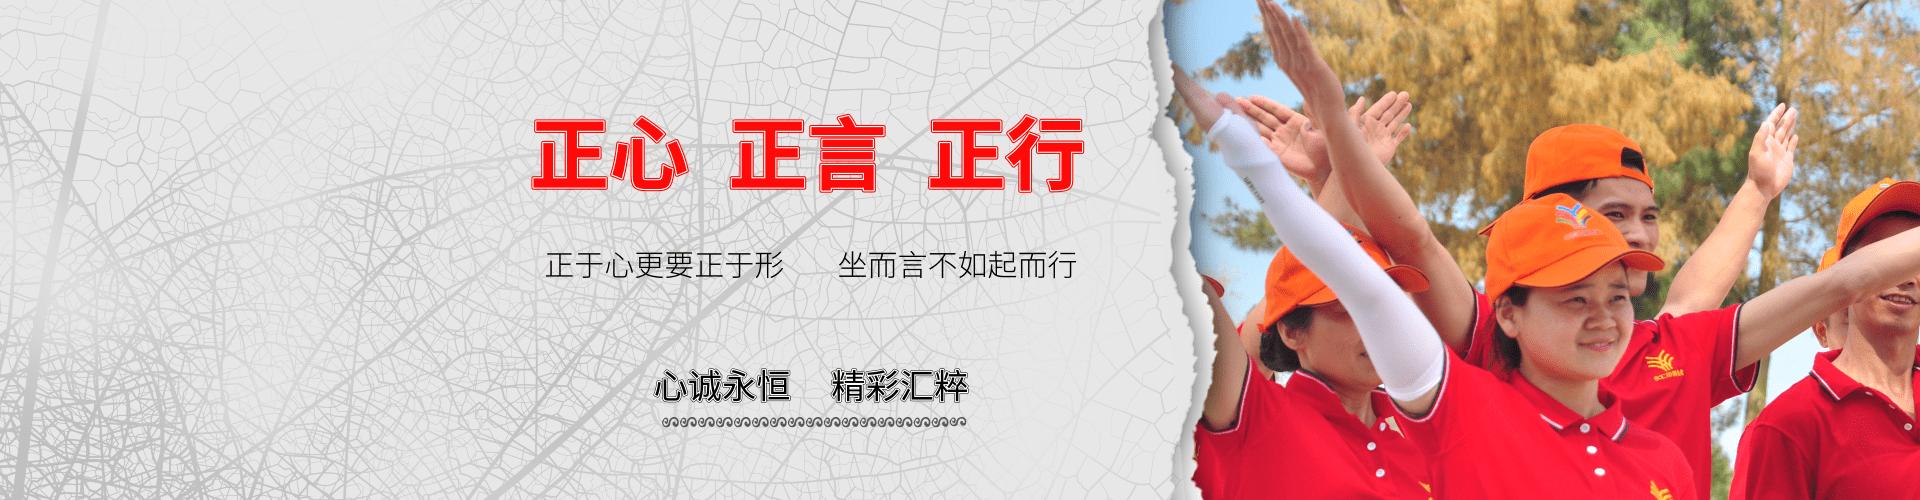 企业文化banner@凡科快图.png